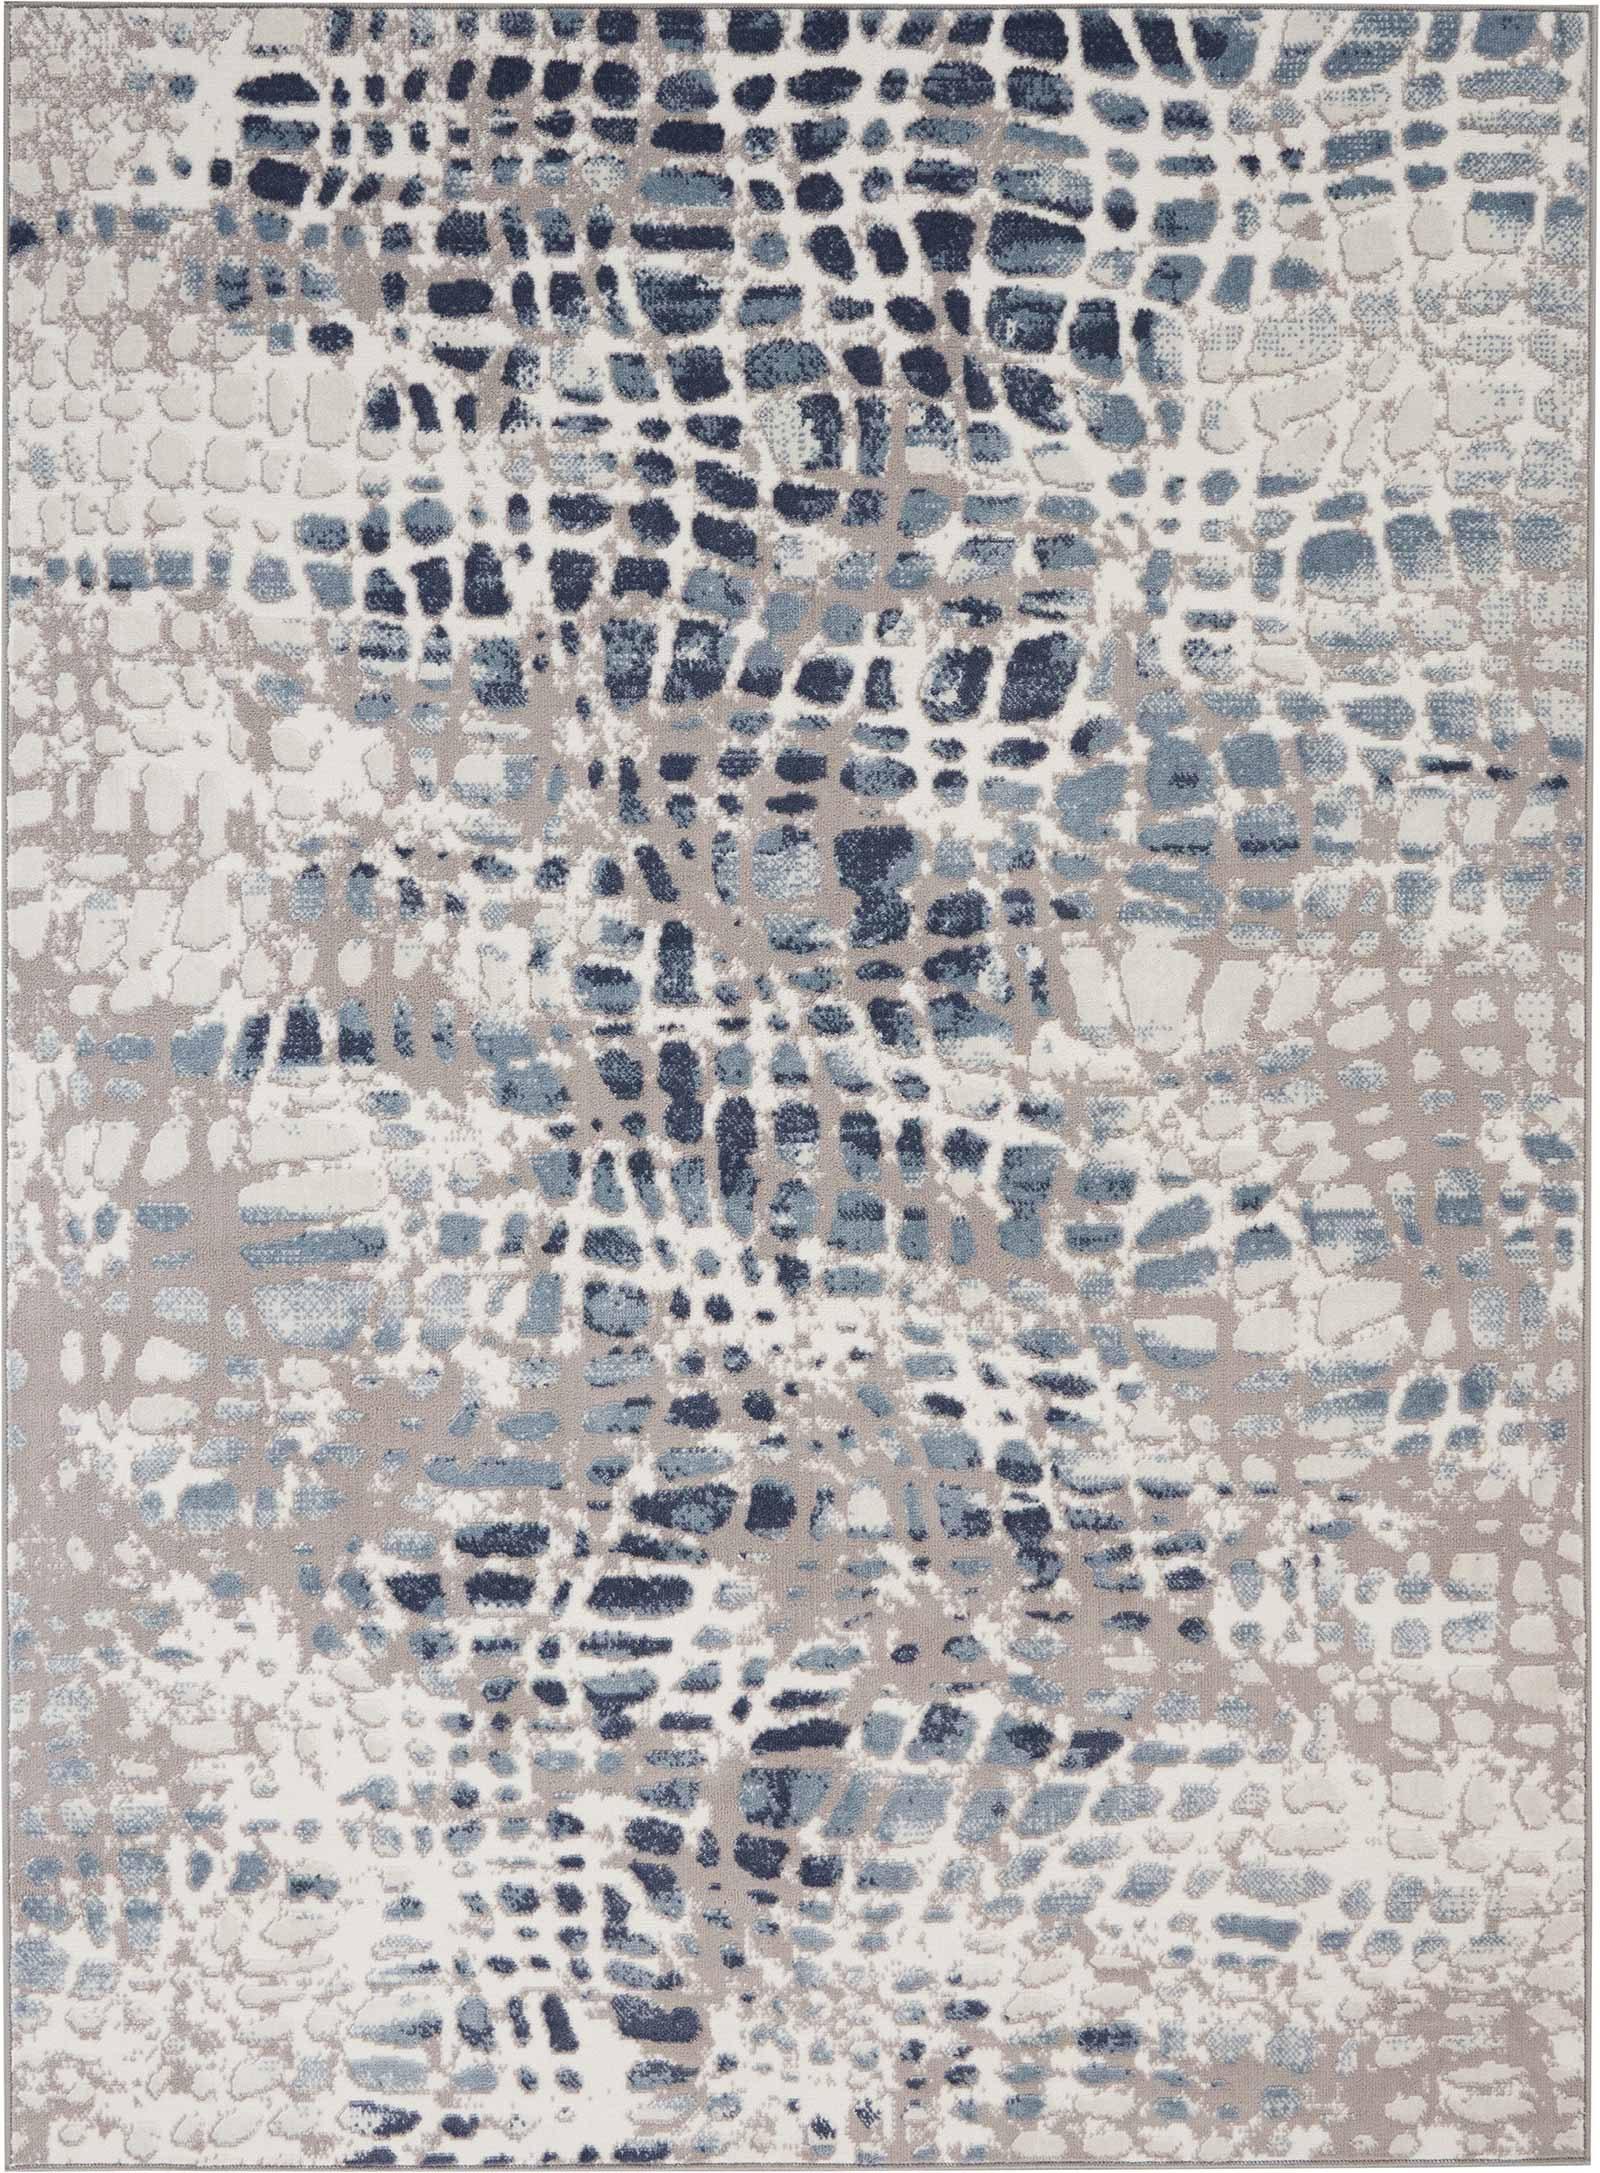 Nourison rug Urban Decor URD04 IVGRY 5x7 099446467119 main 1